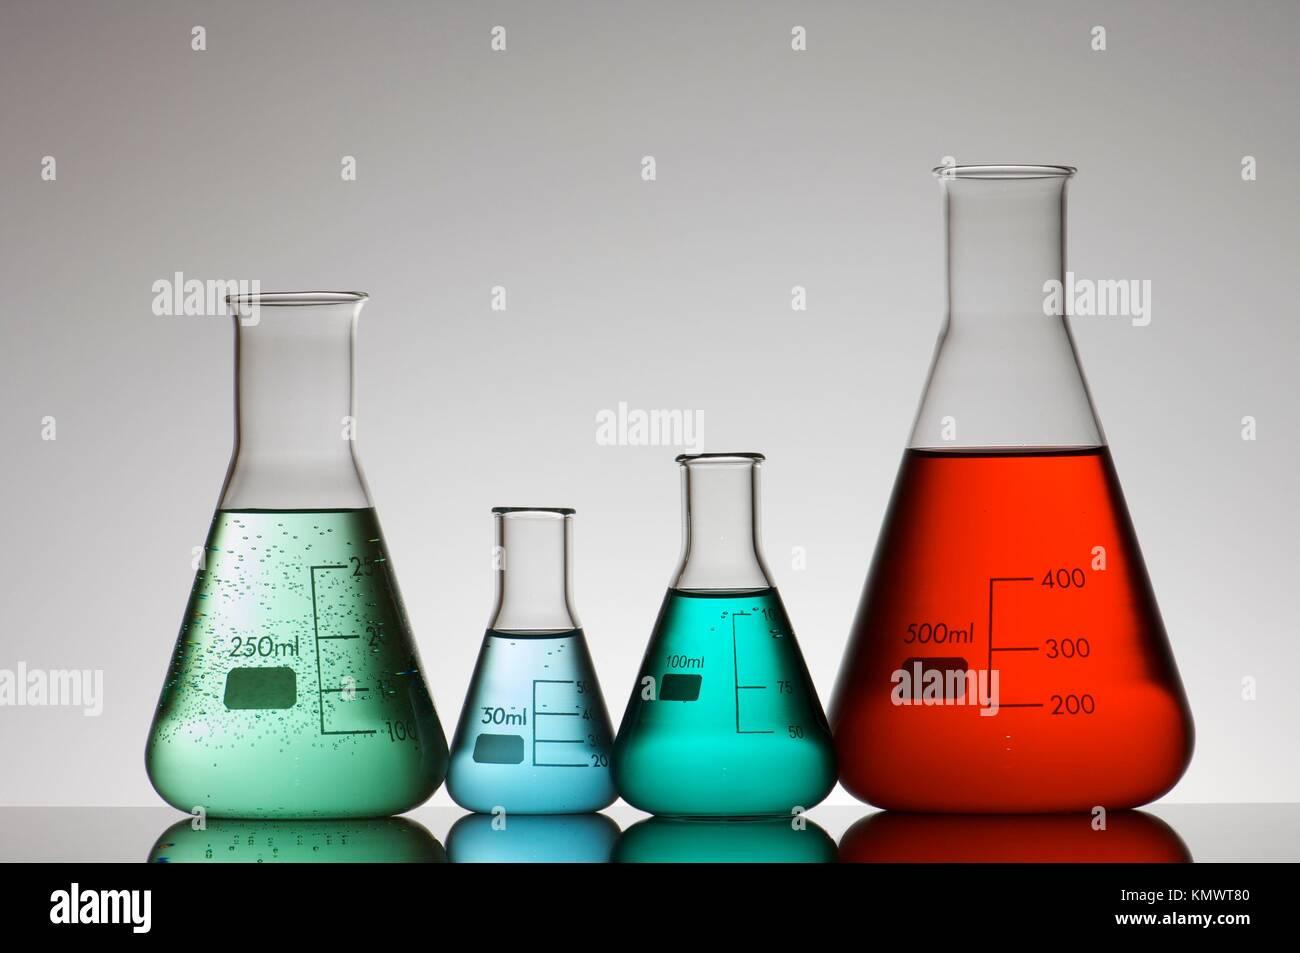 Chemistry Lab Stock Photos & Chemistry Lab Stock Images - Alamy